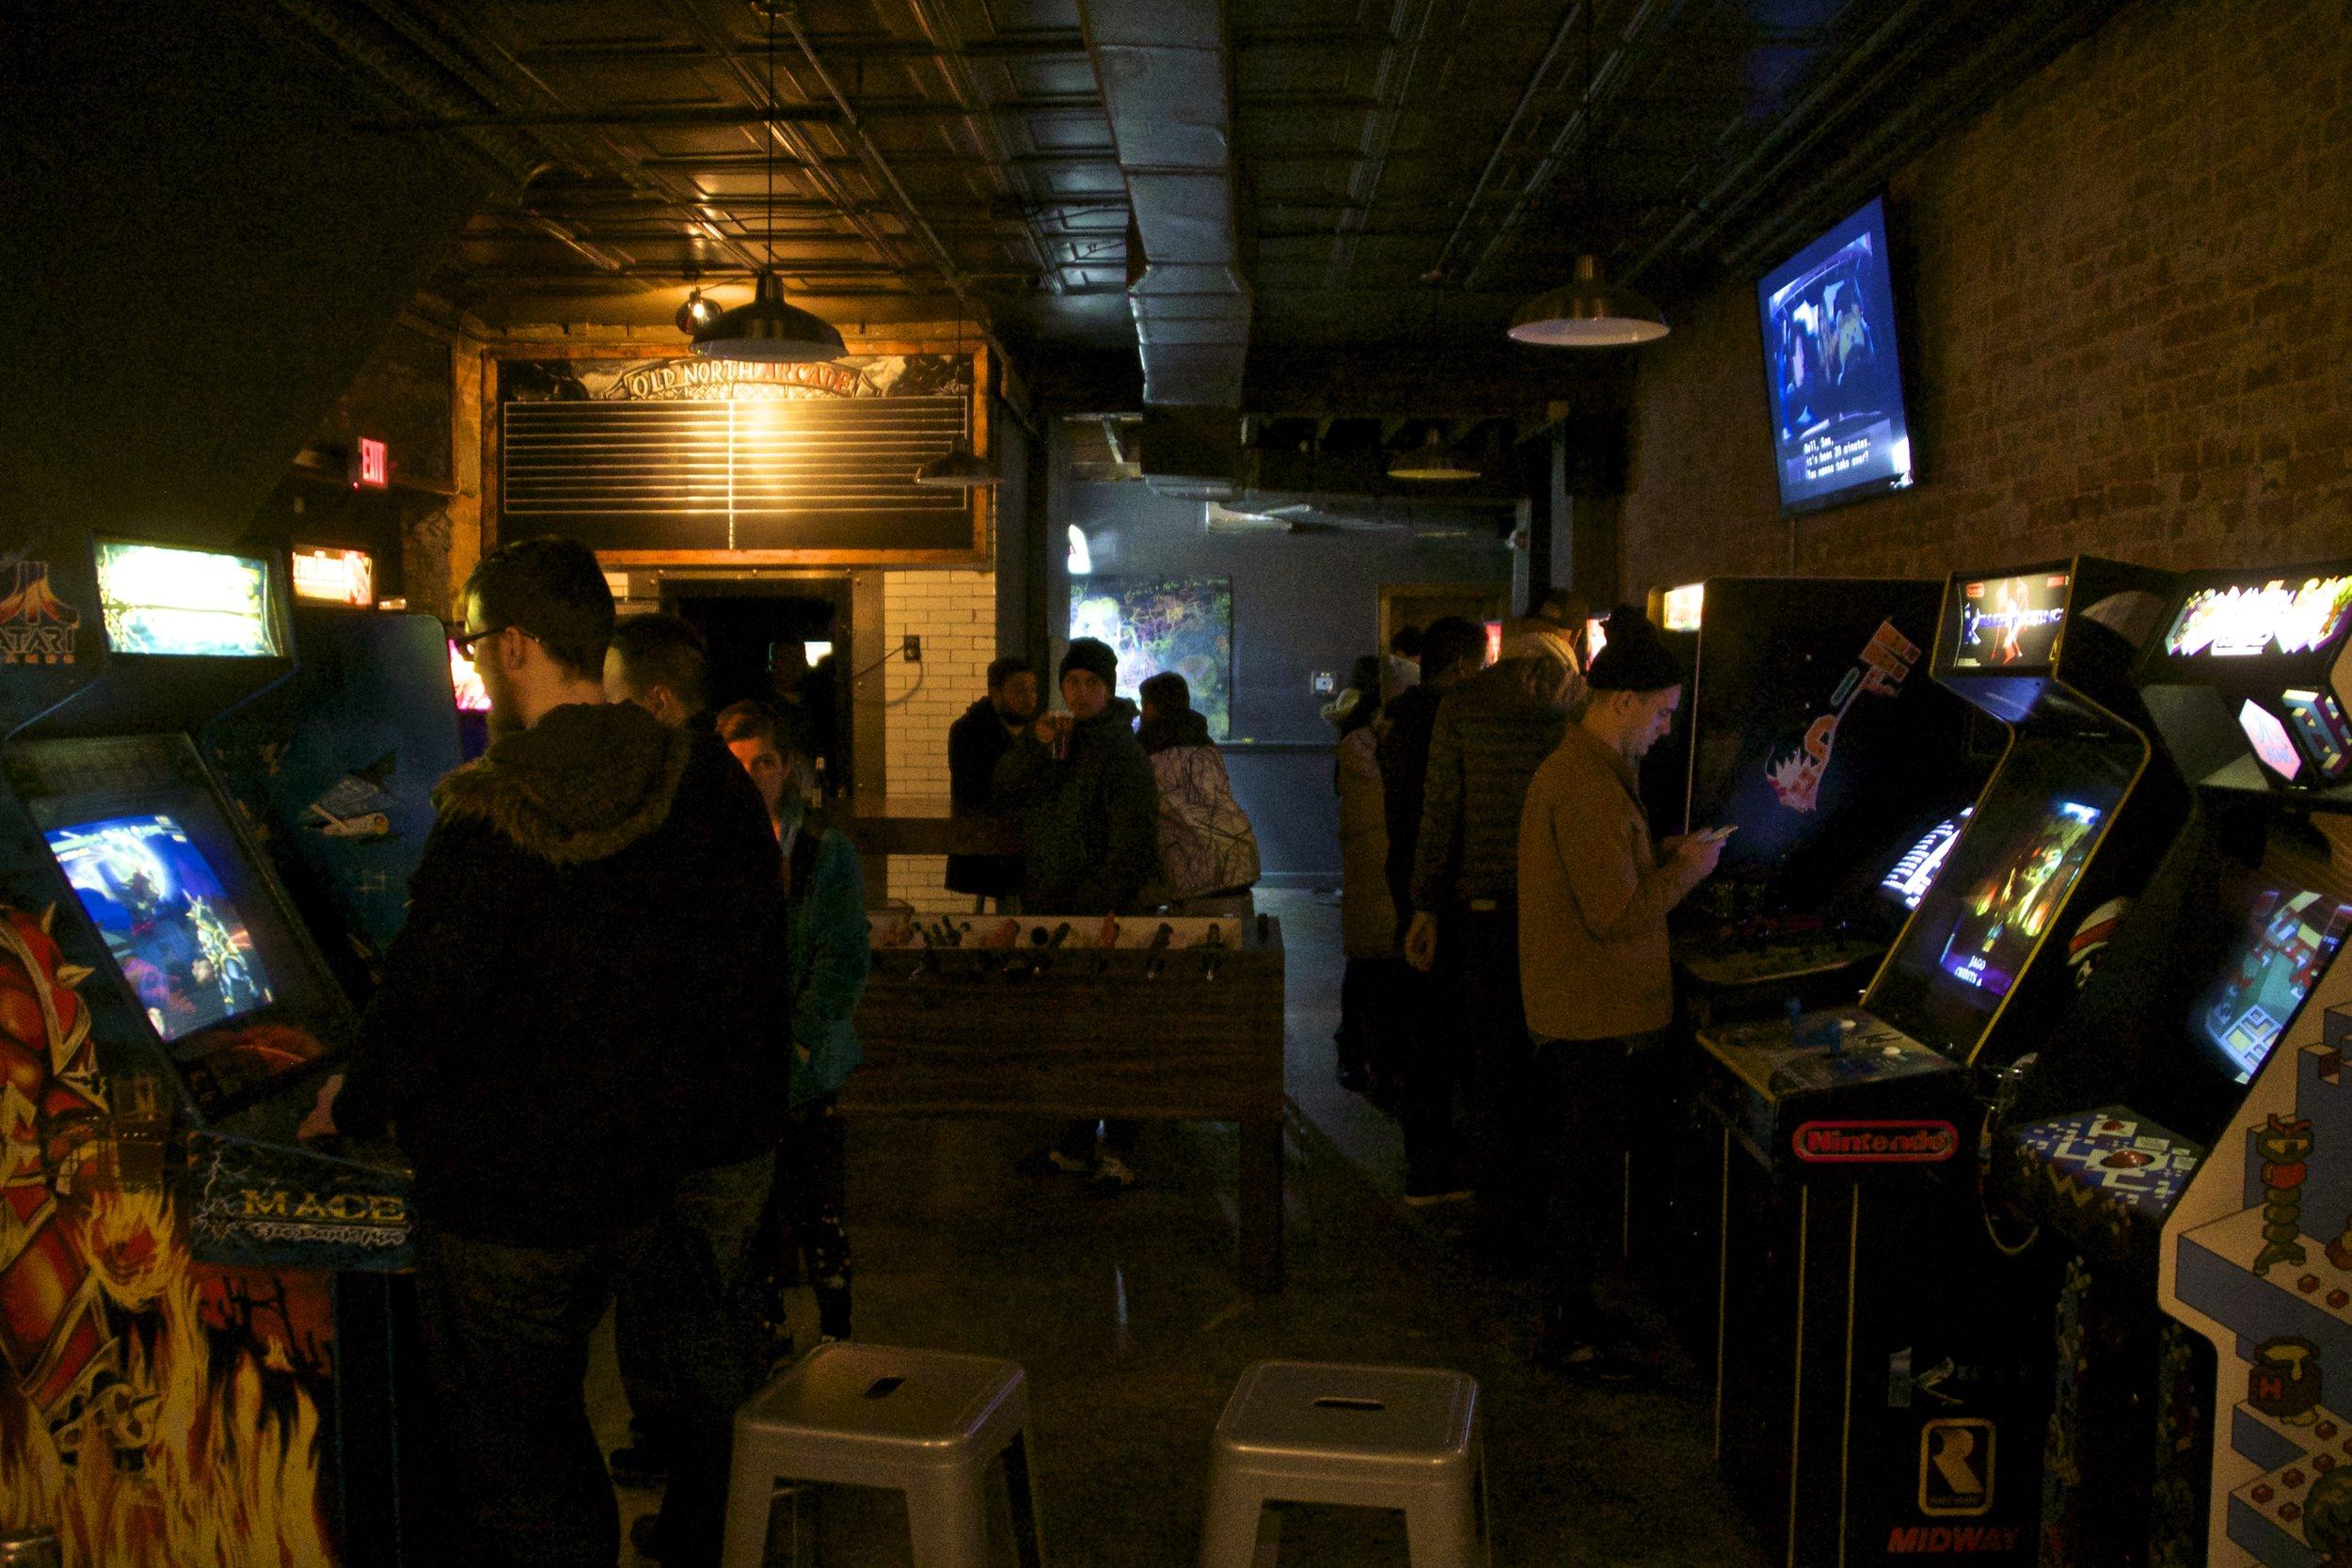 Old North Arcade Columbus Ohio Bars 13.jpg